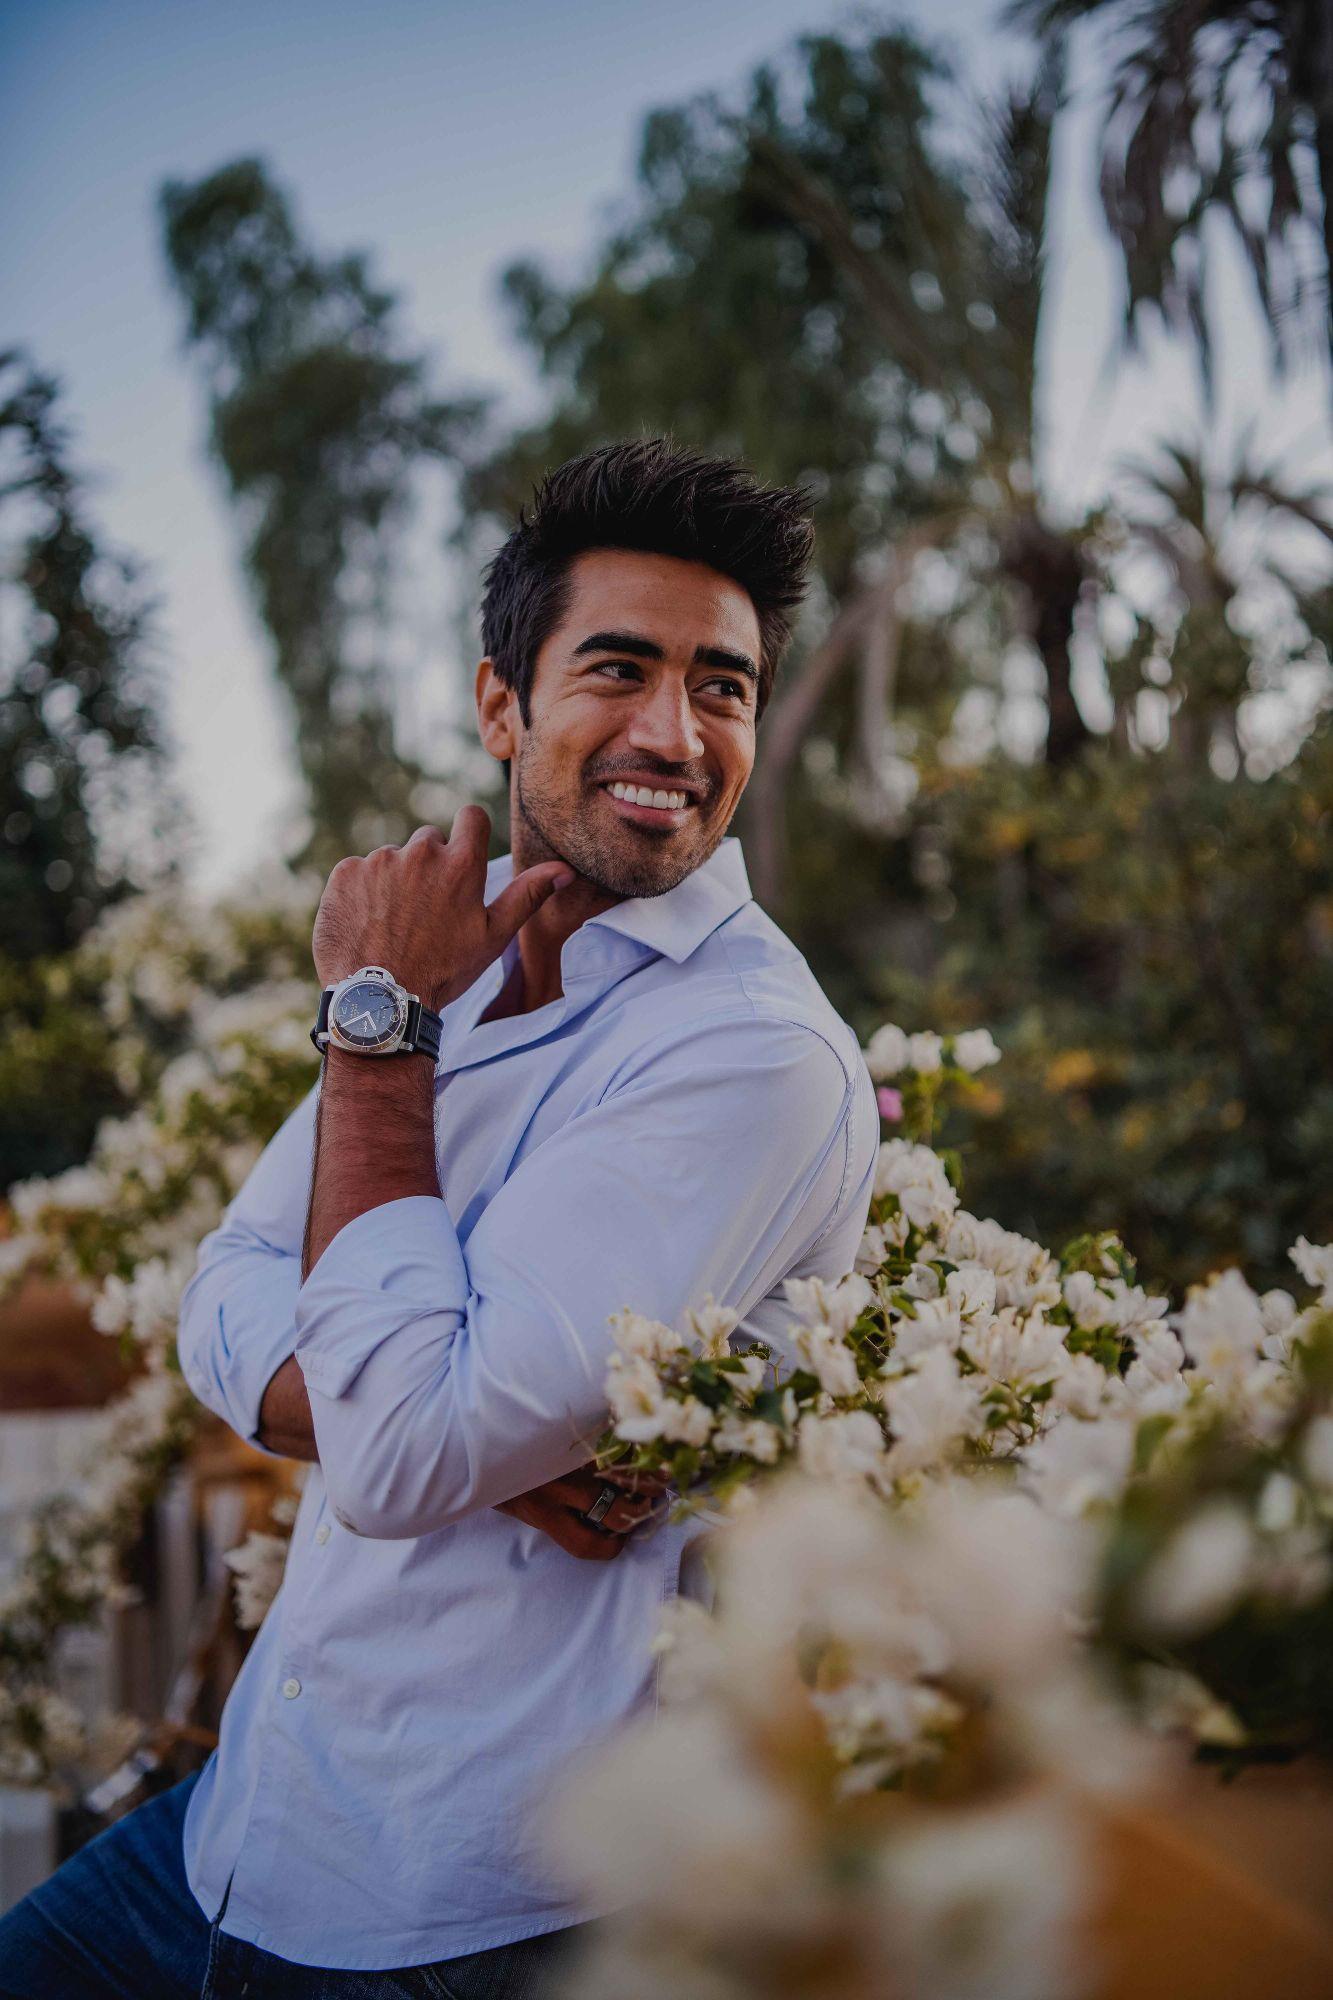 Panerai reveals that its new global ambassador is entrepreneur and Tatler Asia contributing travel editor Jeremy Jauncey